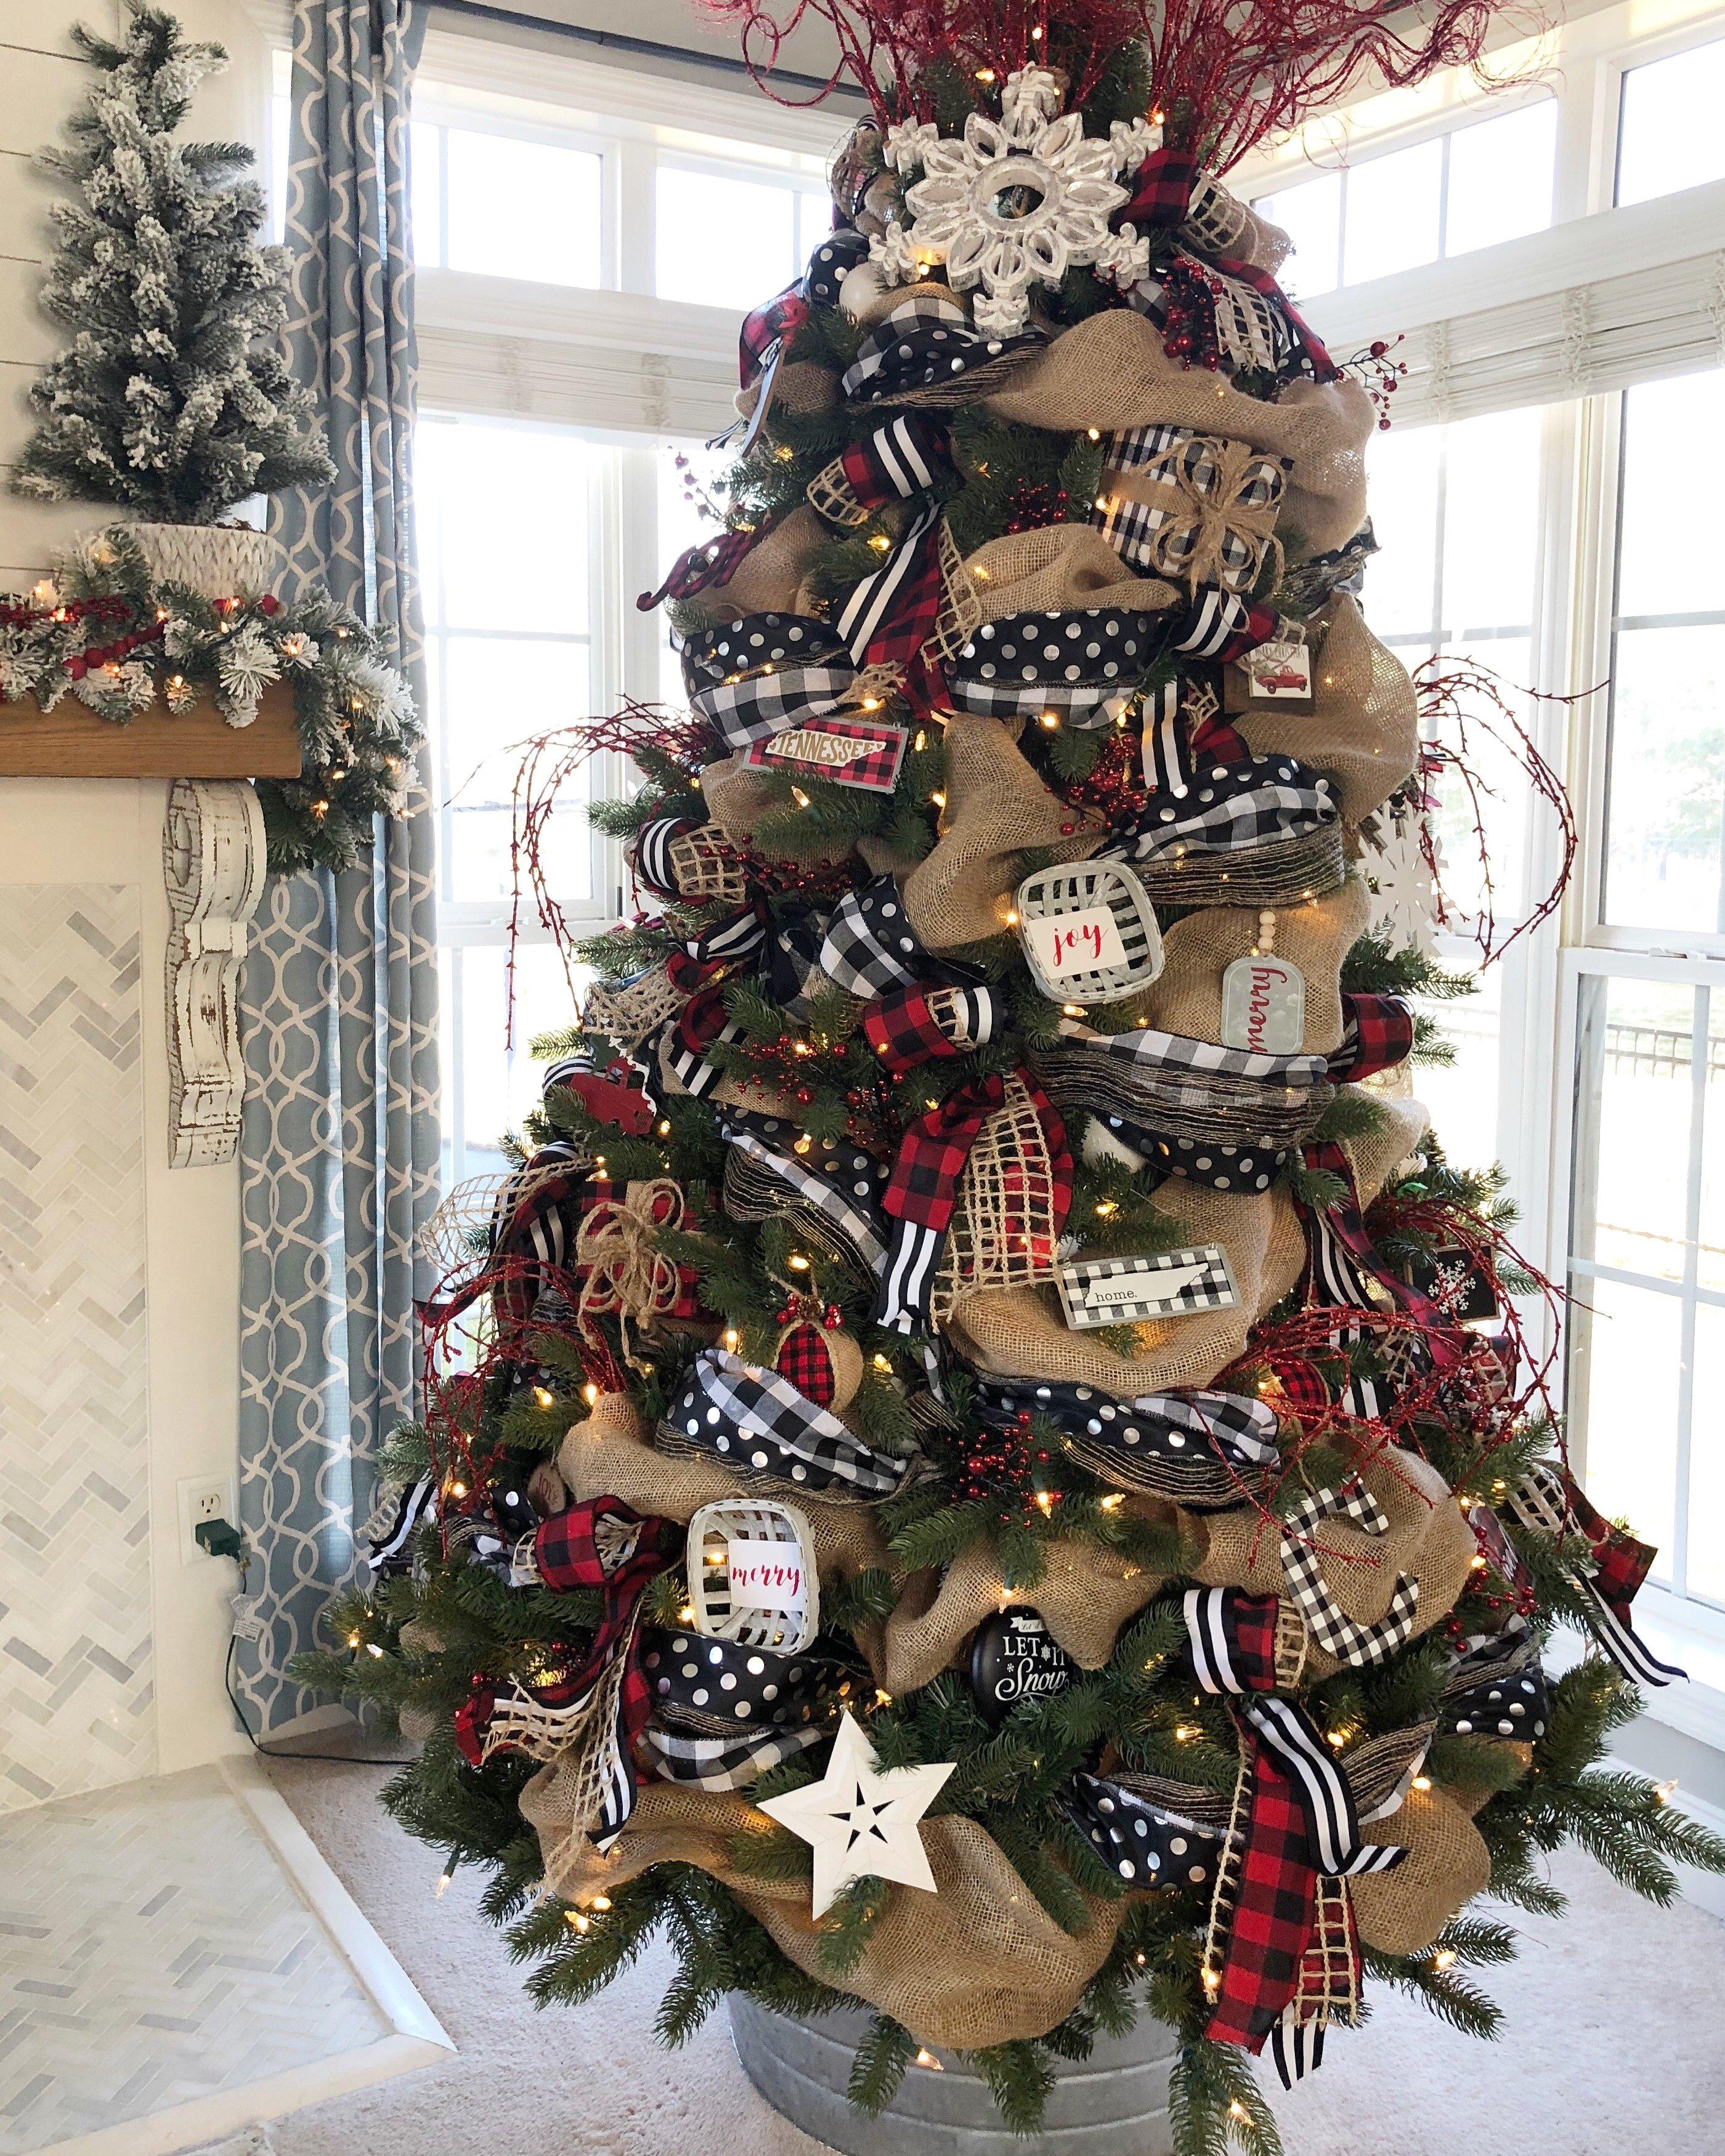 Buffalo Check Christmas Tree Decor.Buffalo Check Christmas Tree Decorated With Ribbon